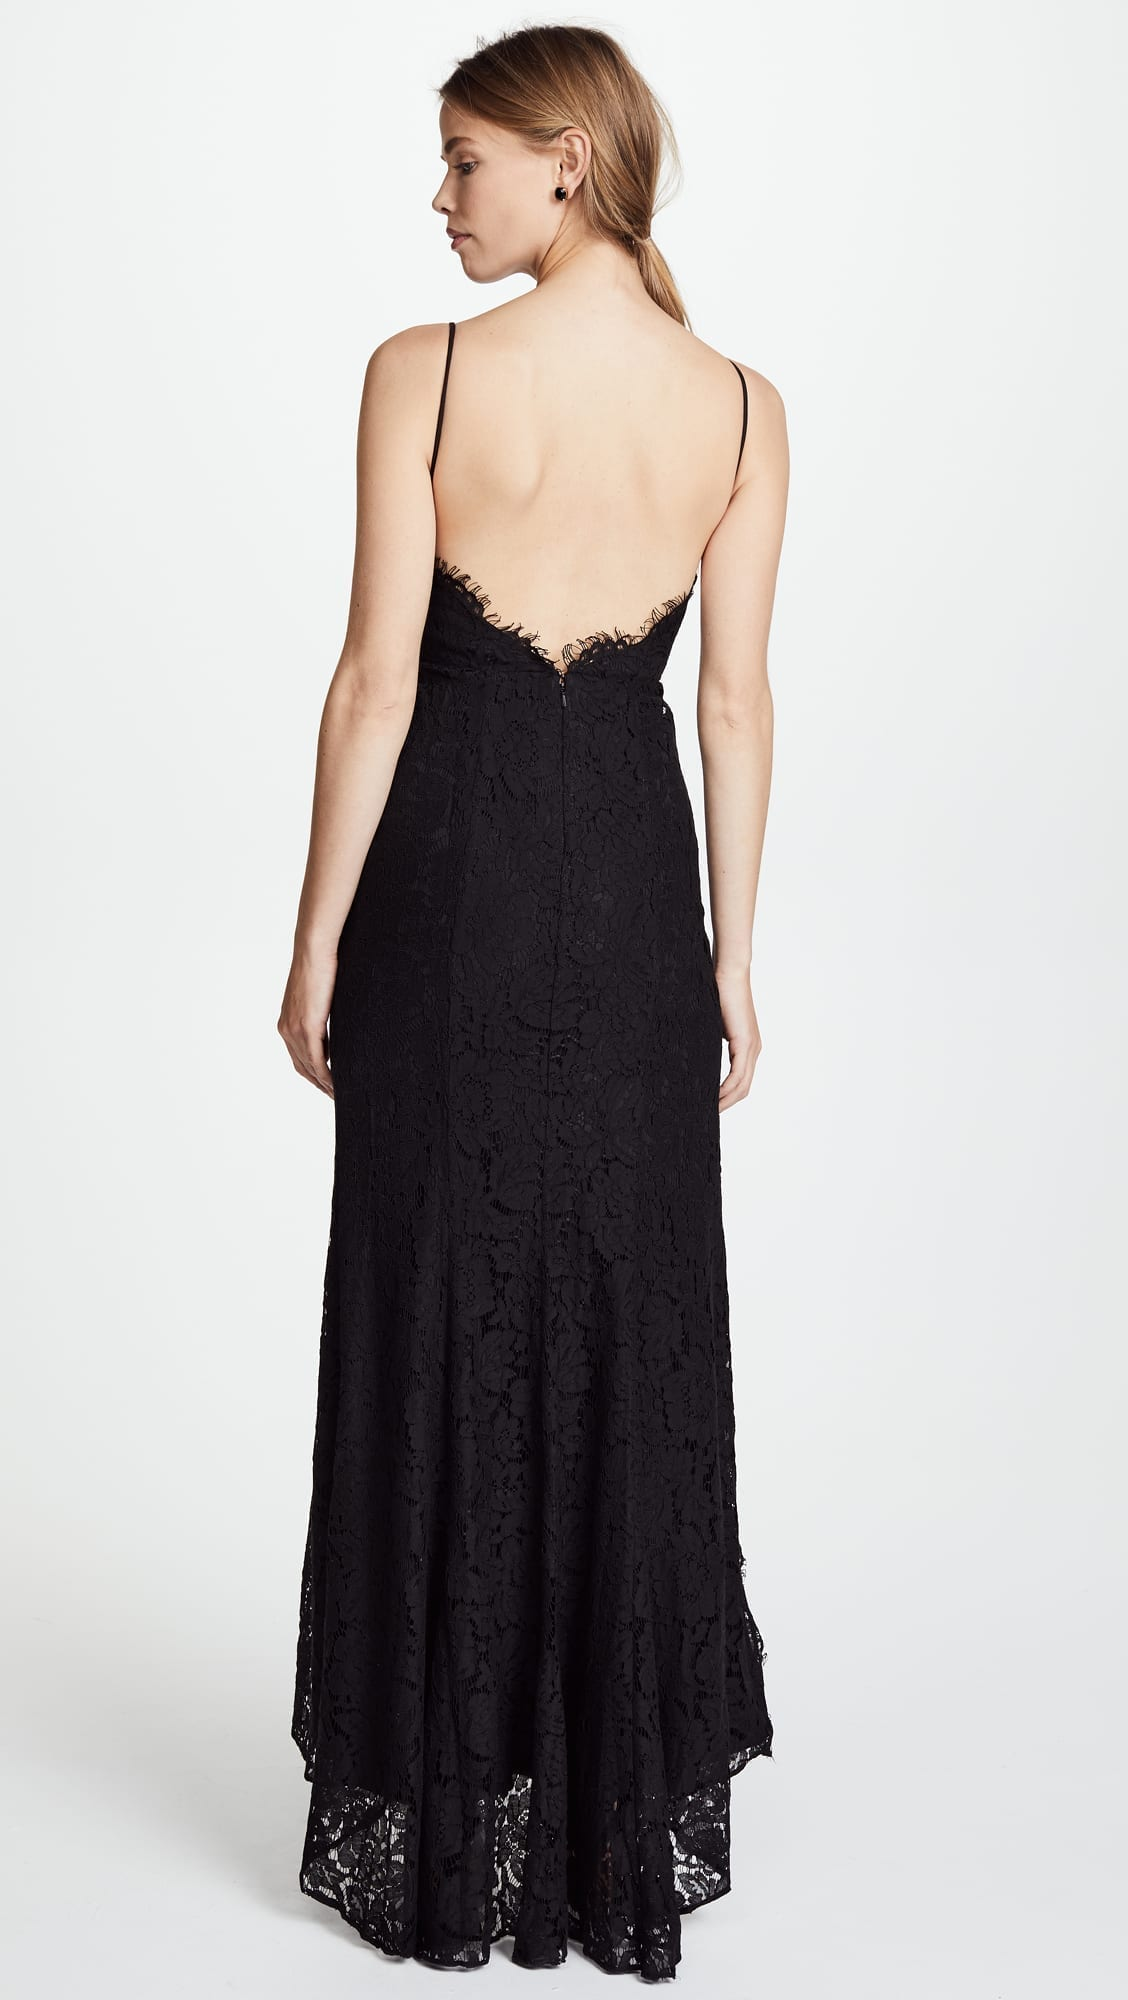 5ce6b762fef8f FAME AND PARTNERS The Everett Black Dress - We Select Dresses